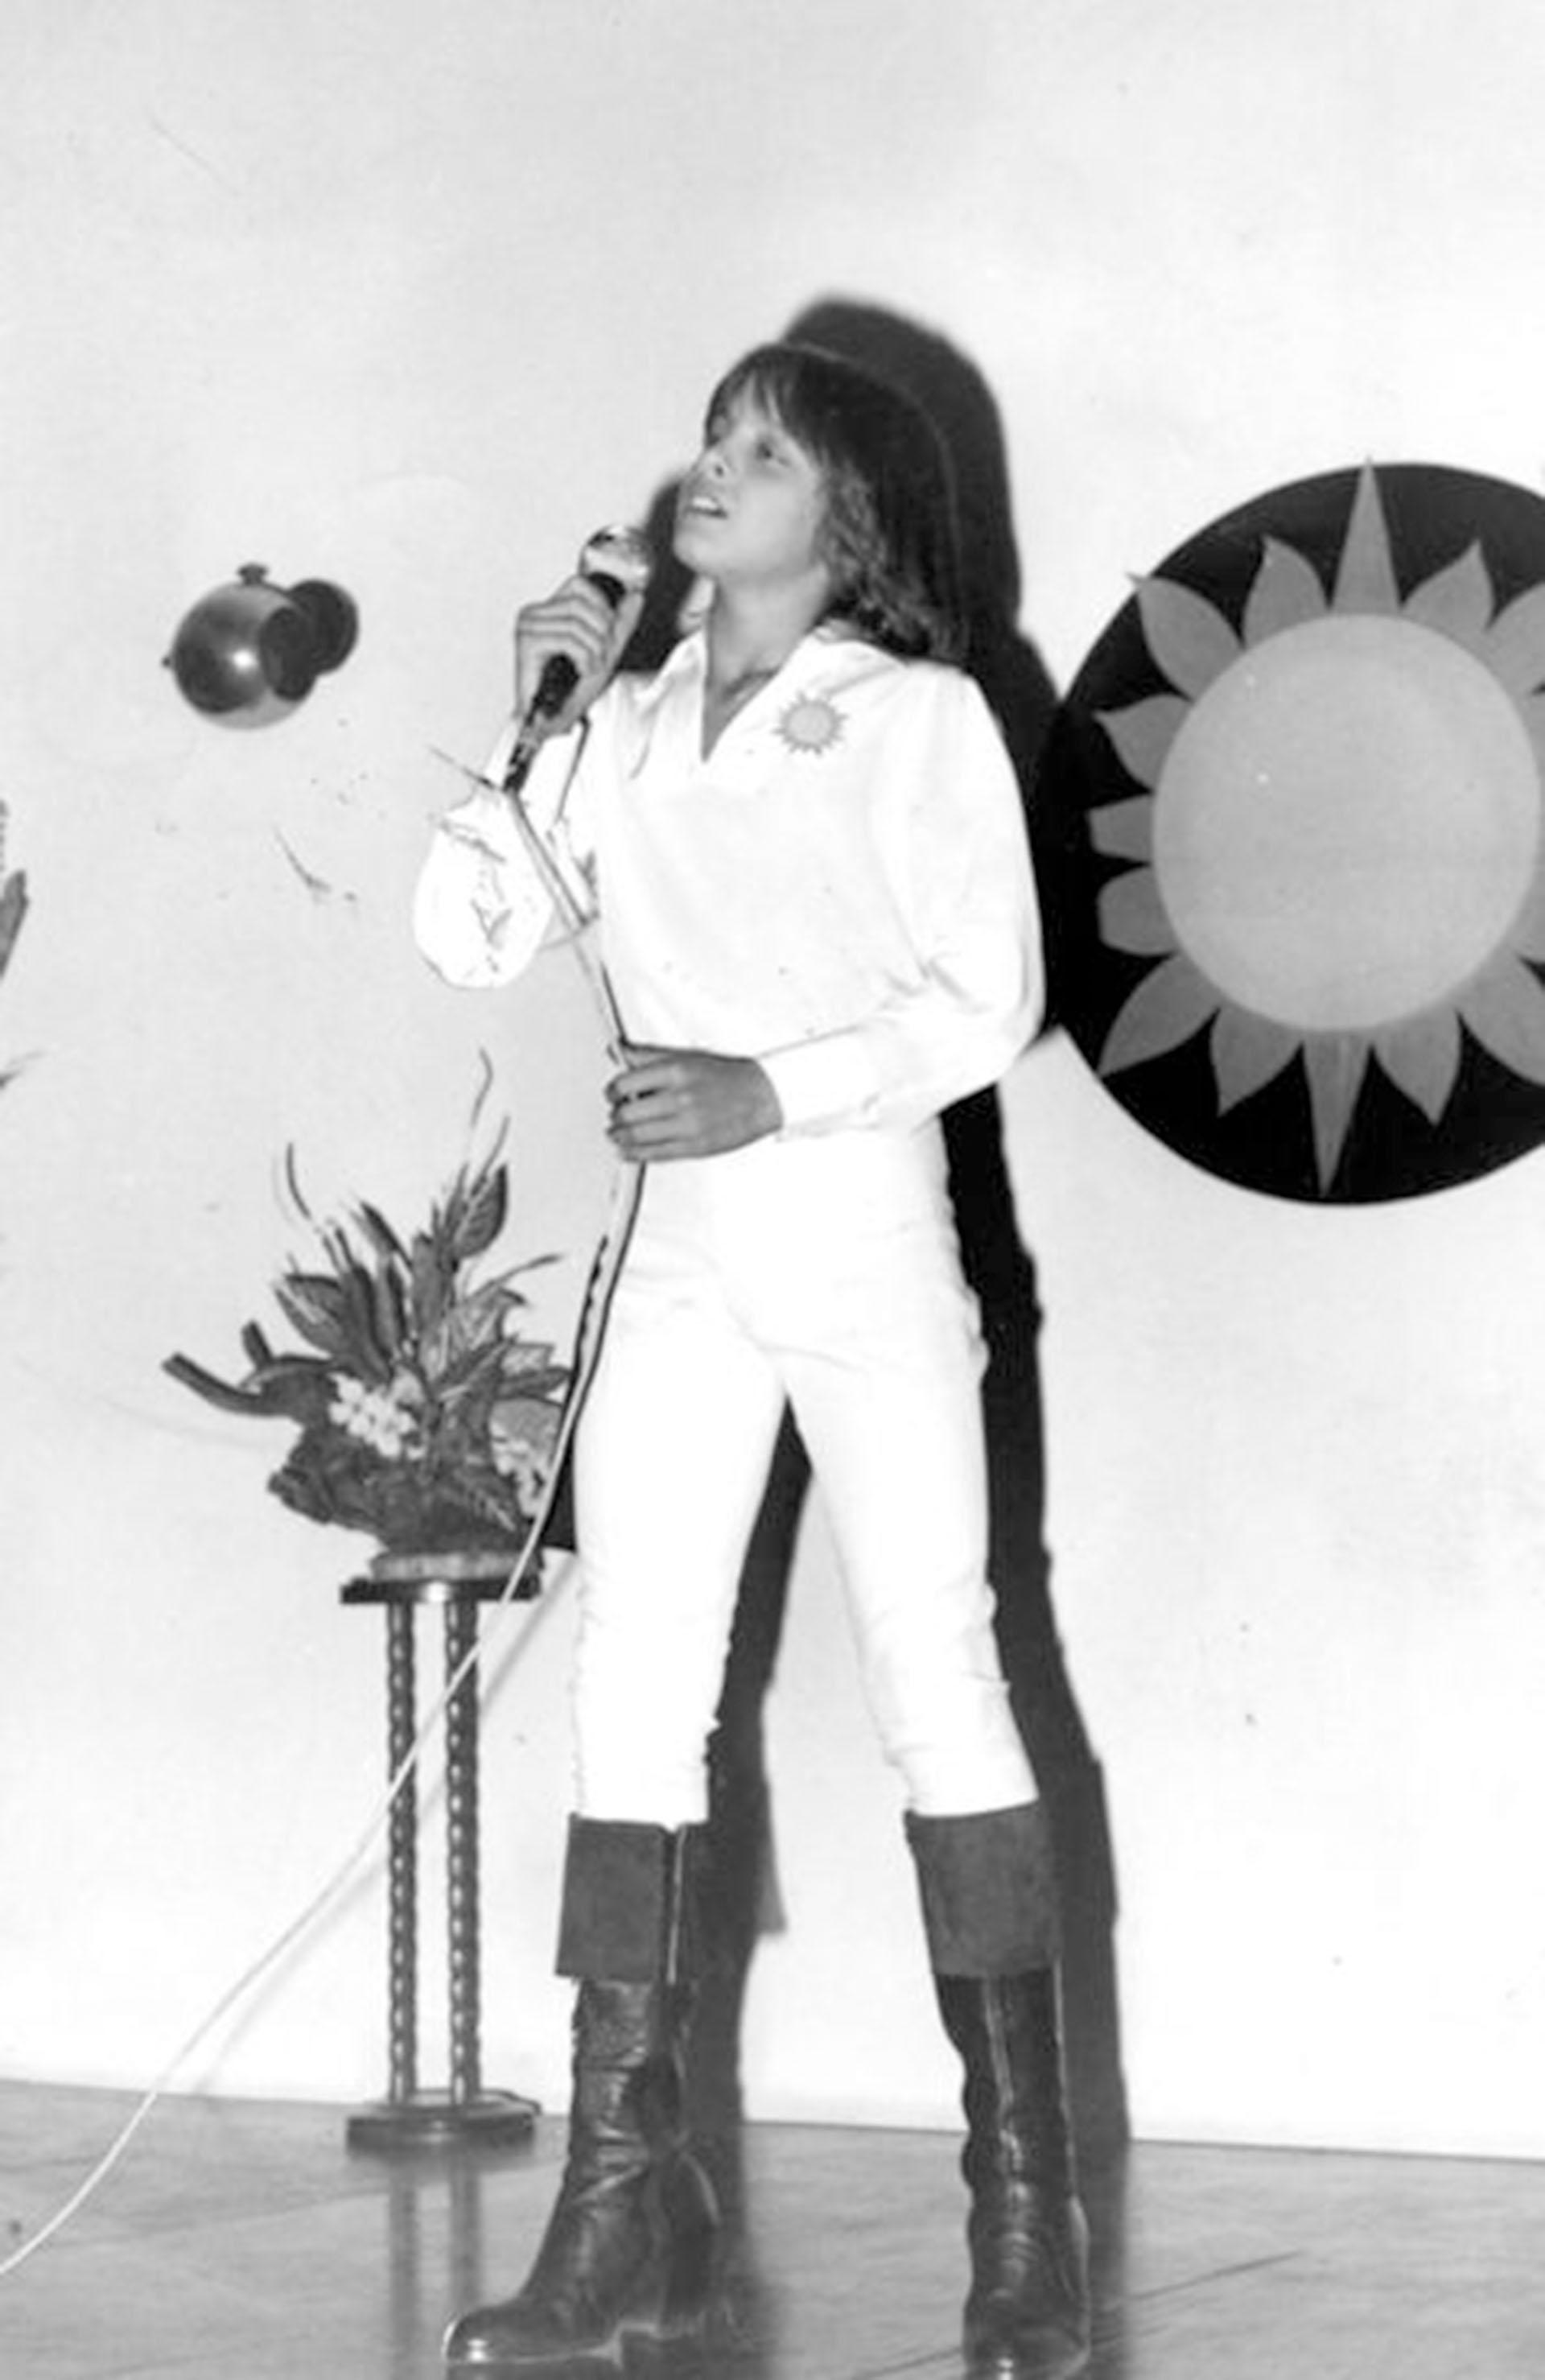 Camisa de mangas largas con un sol bordado, pantalones achupinados, botas de caña alta, un sello durante su niñez